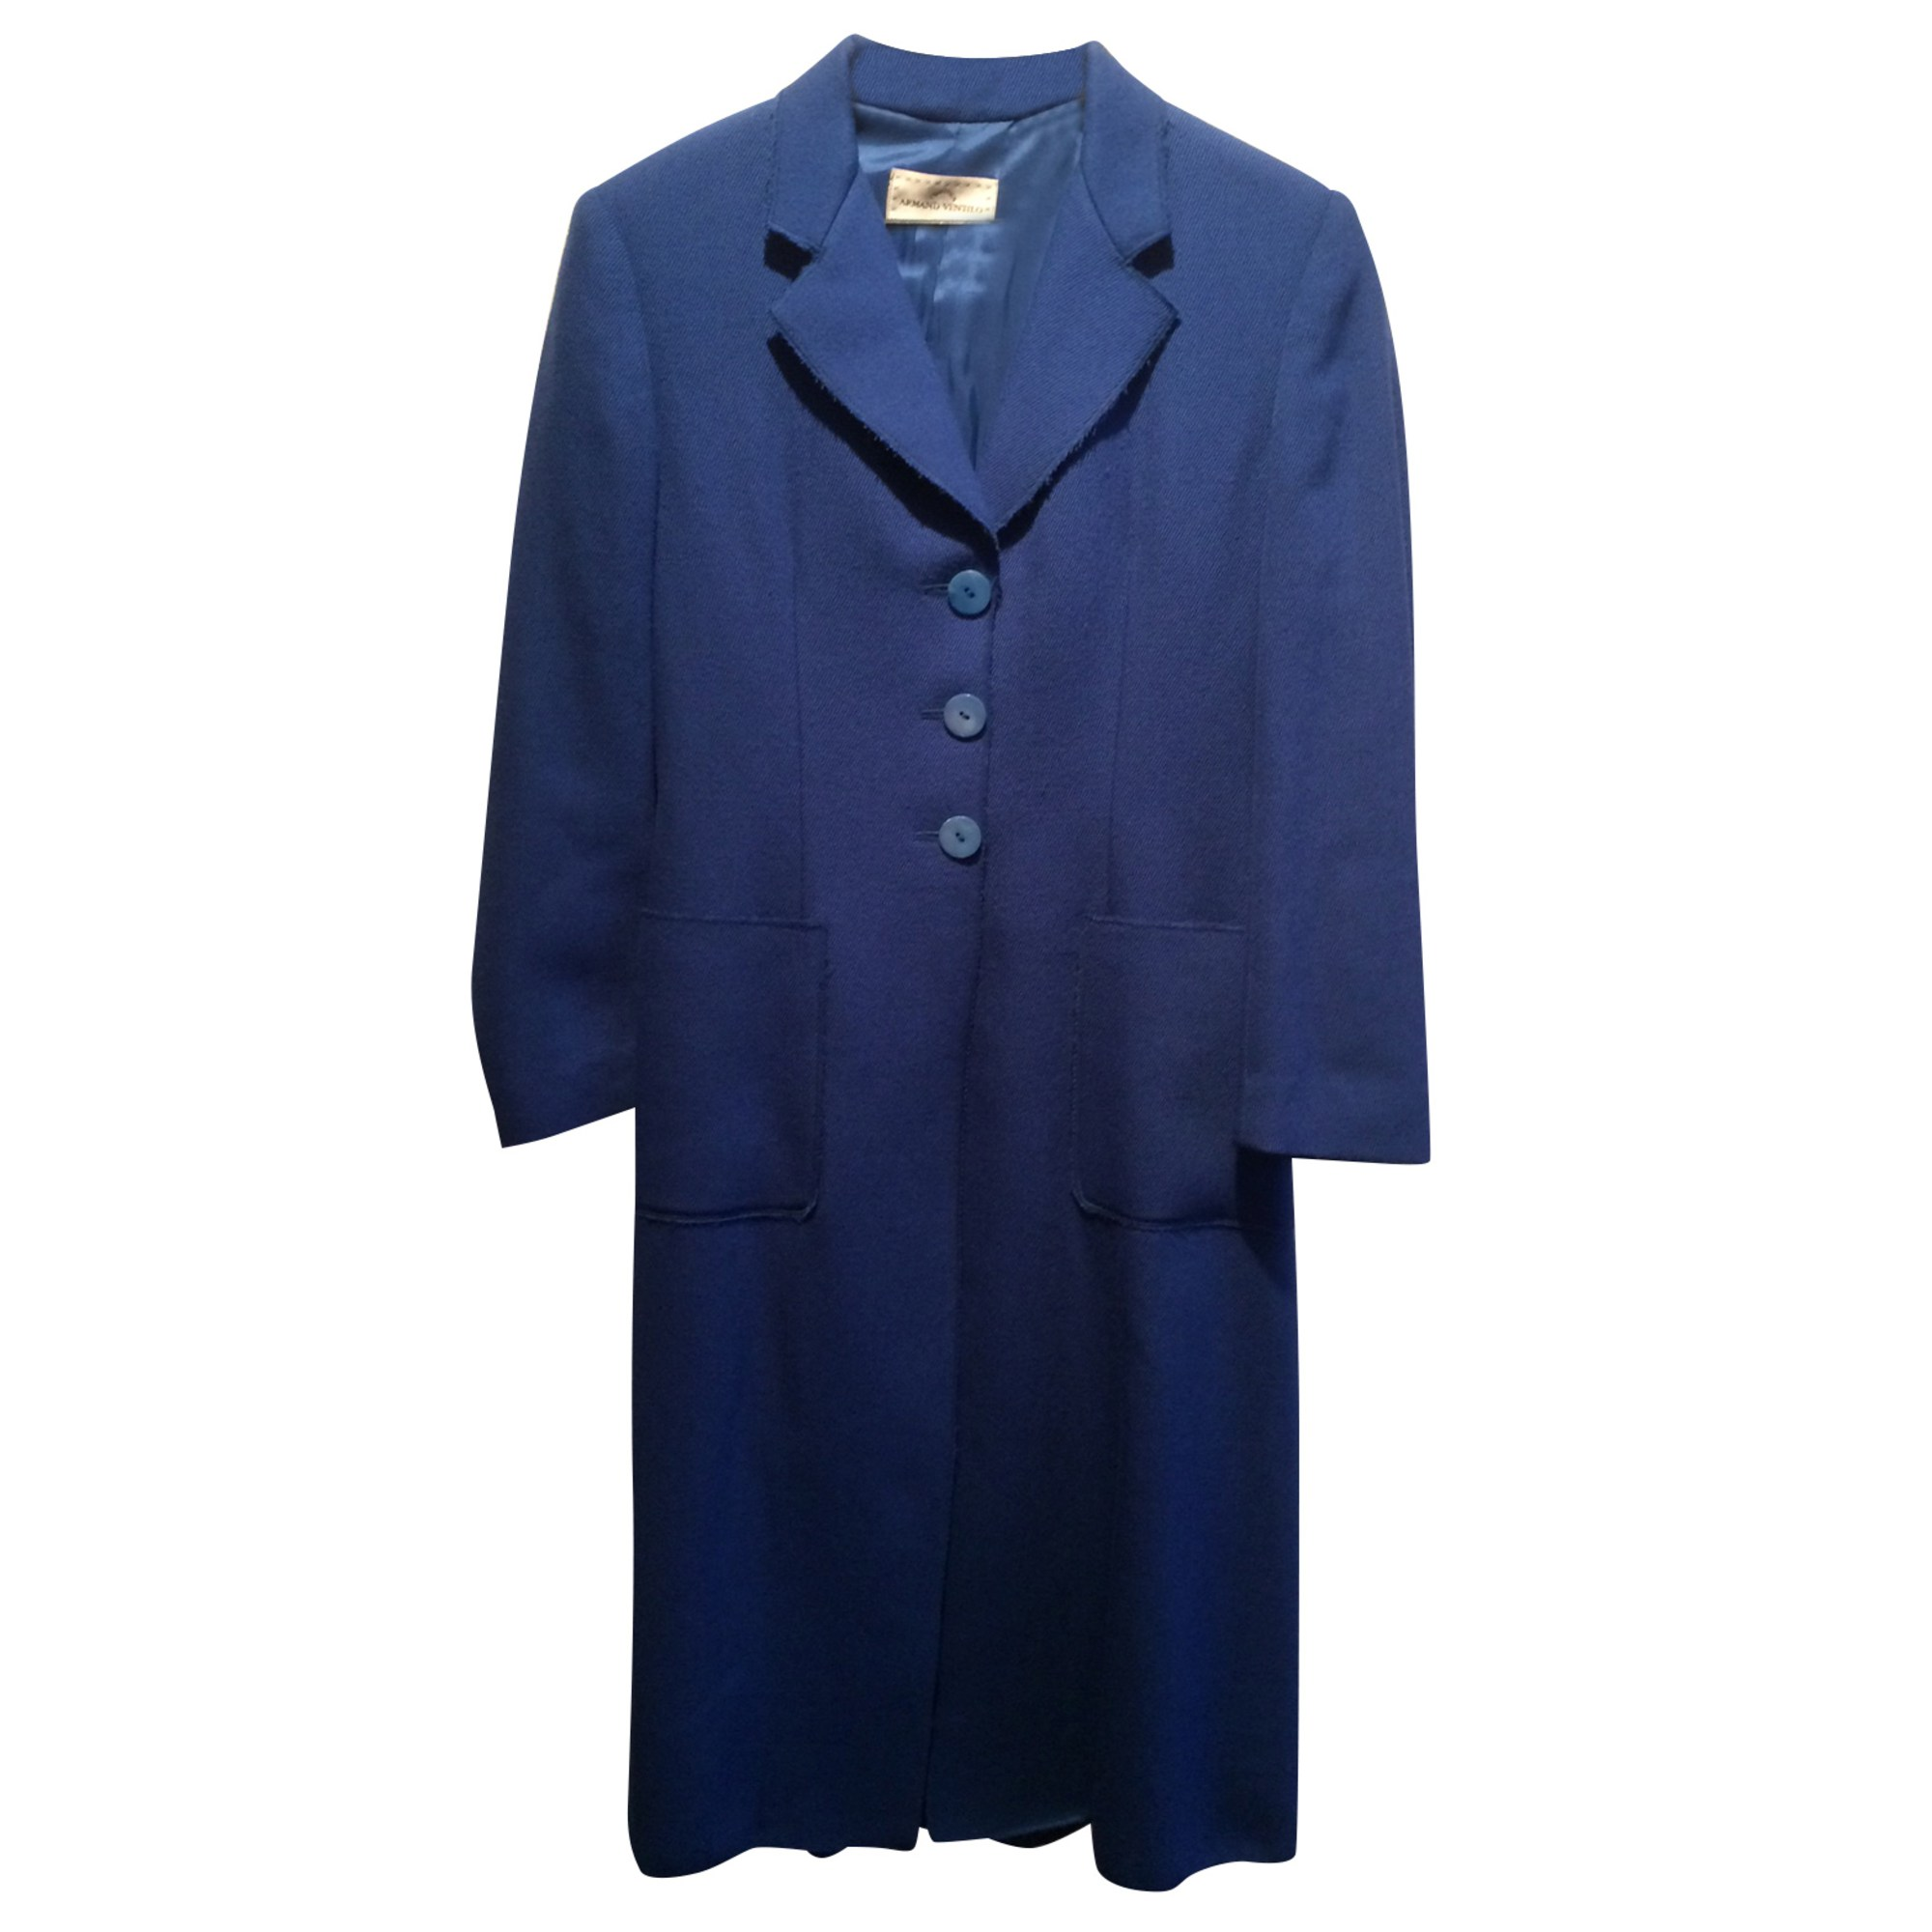 Manteau ARMAND VENTILO Bleu, bleu marine, bleu turquoise